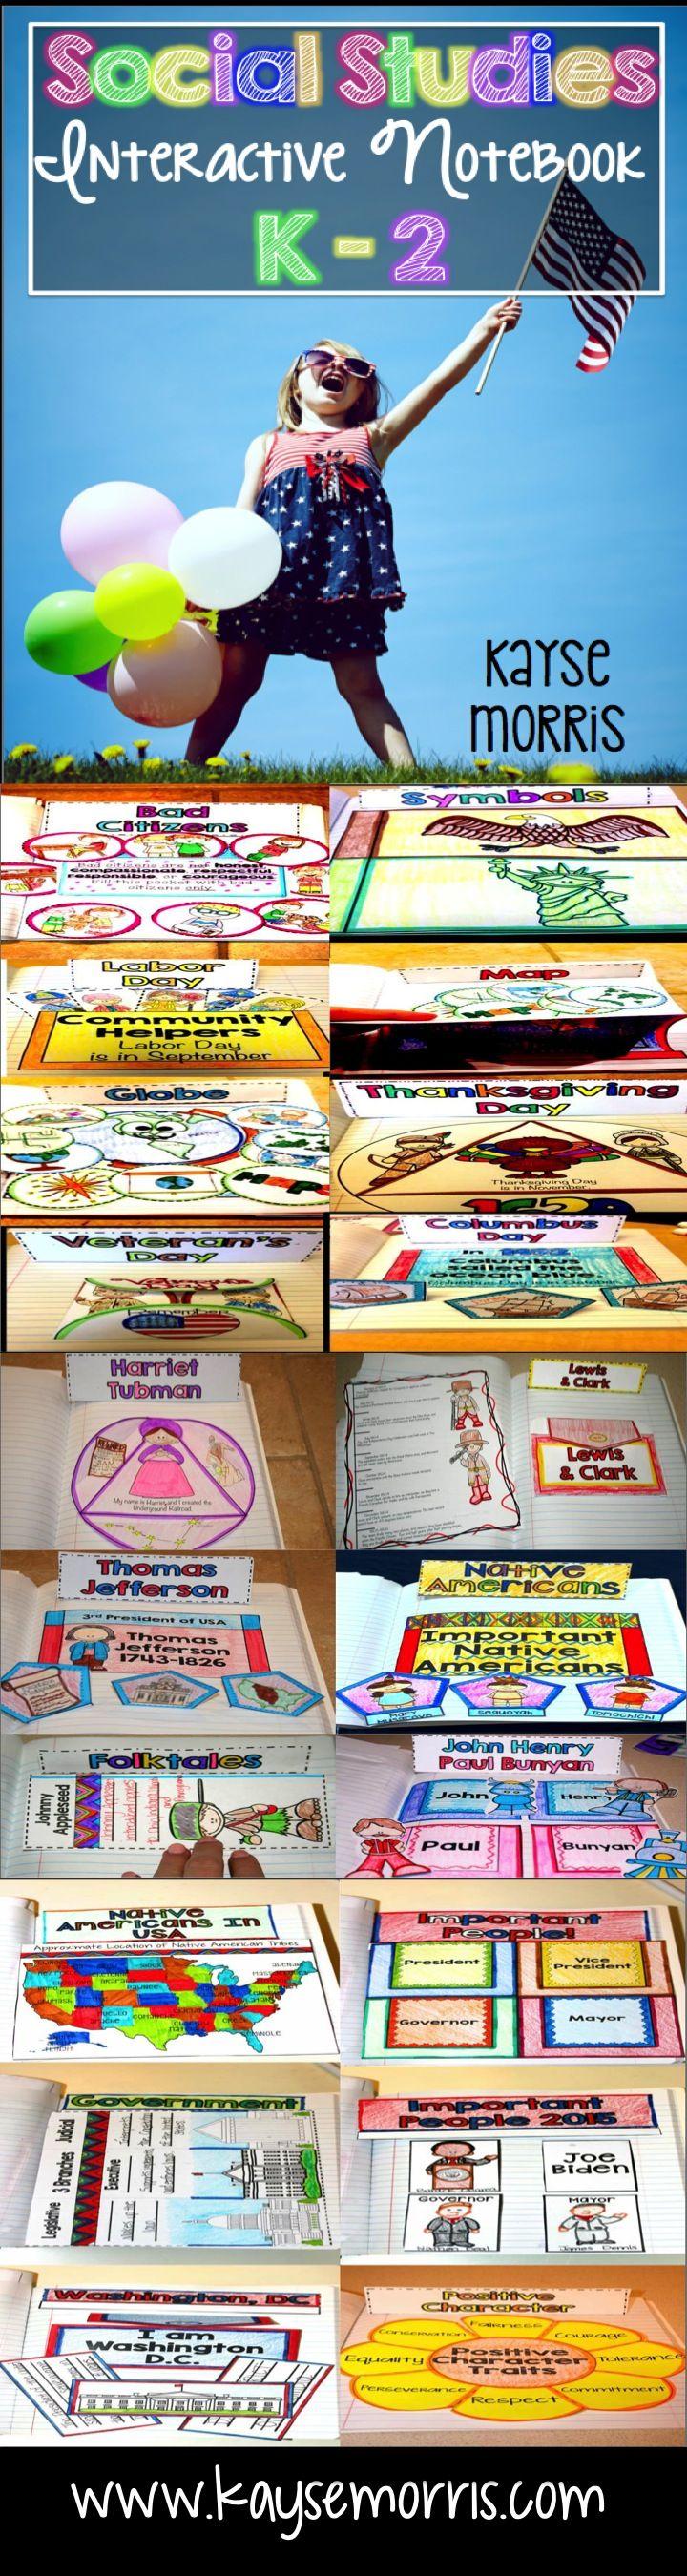 Social Studies Interactive Notebook Kindergarten - 2nd Grade.  www.kaysemorris.com  https://www.teacherspayteachers.com/Product/Social-Studies-Interactive-Notebook-1962505